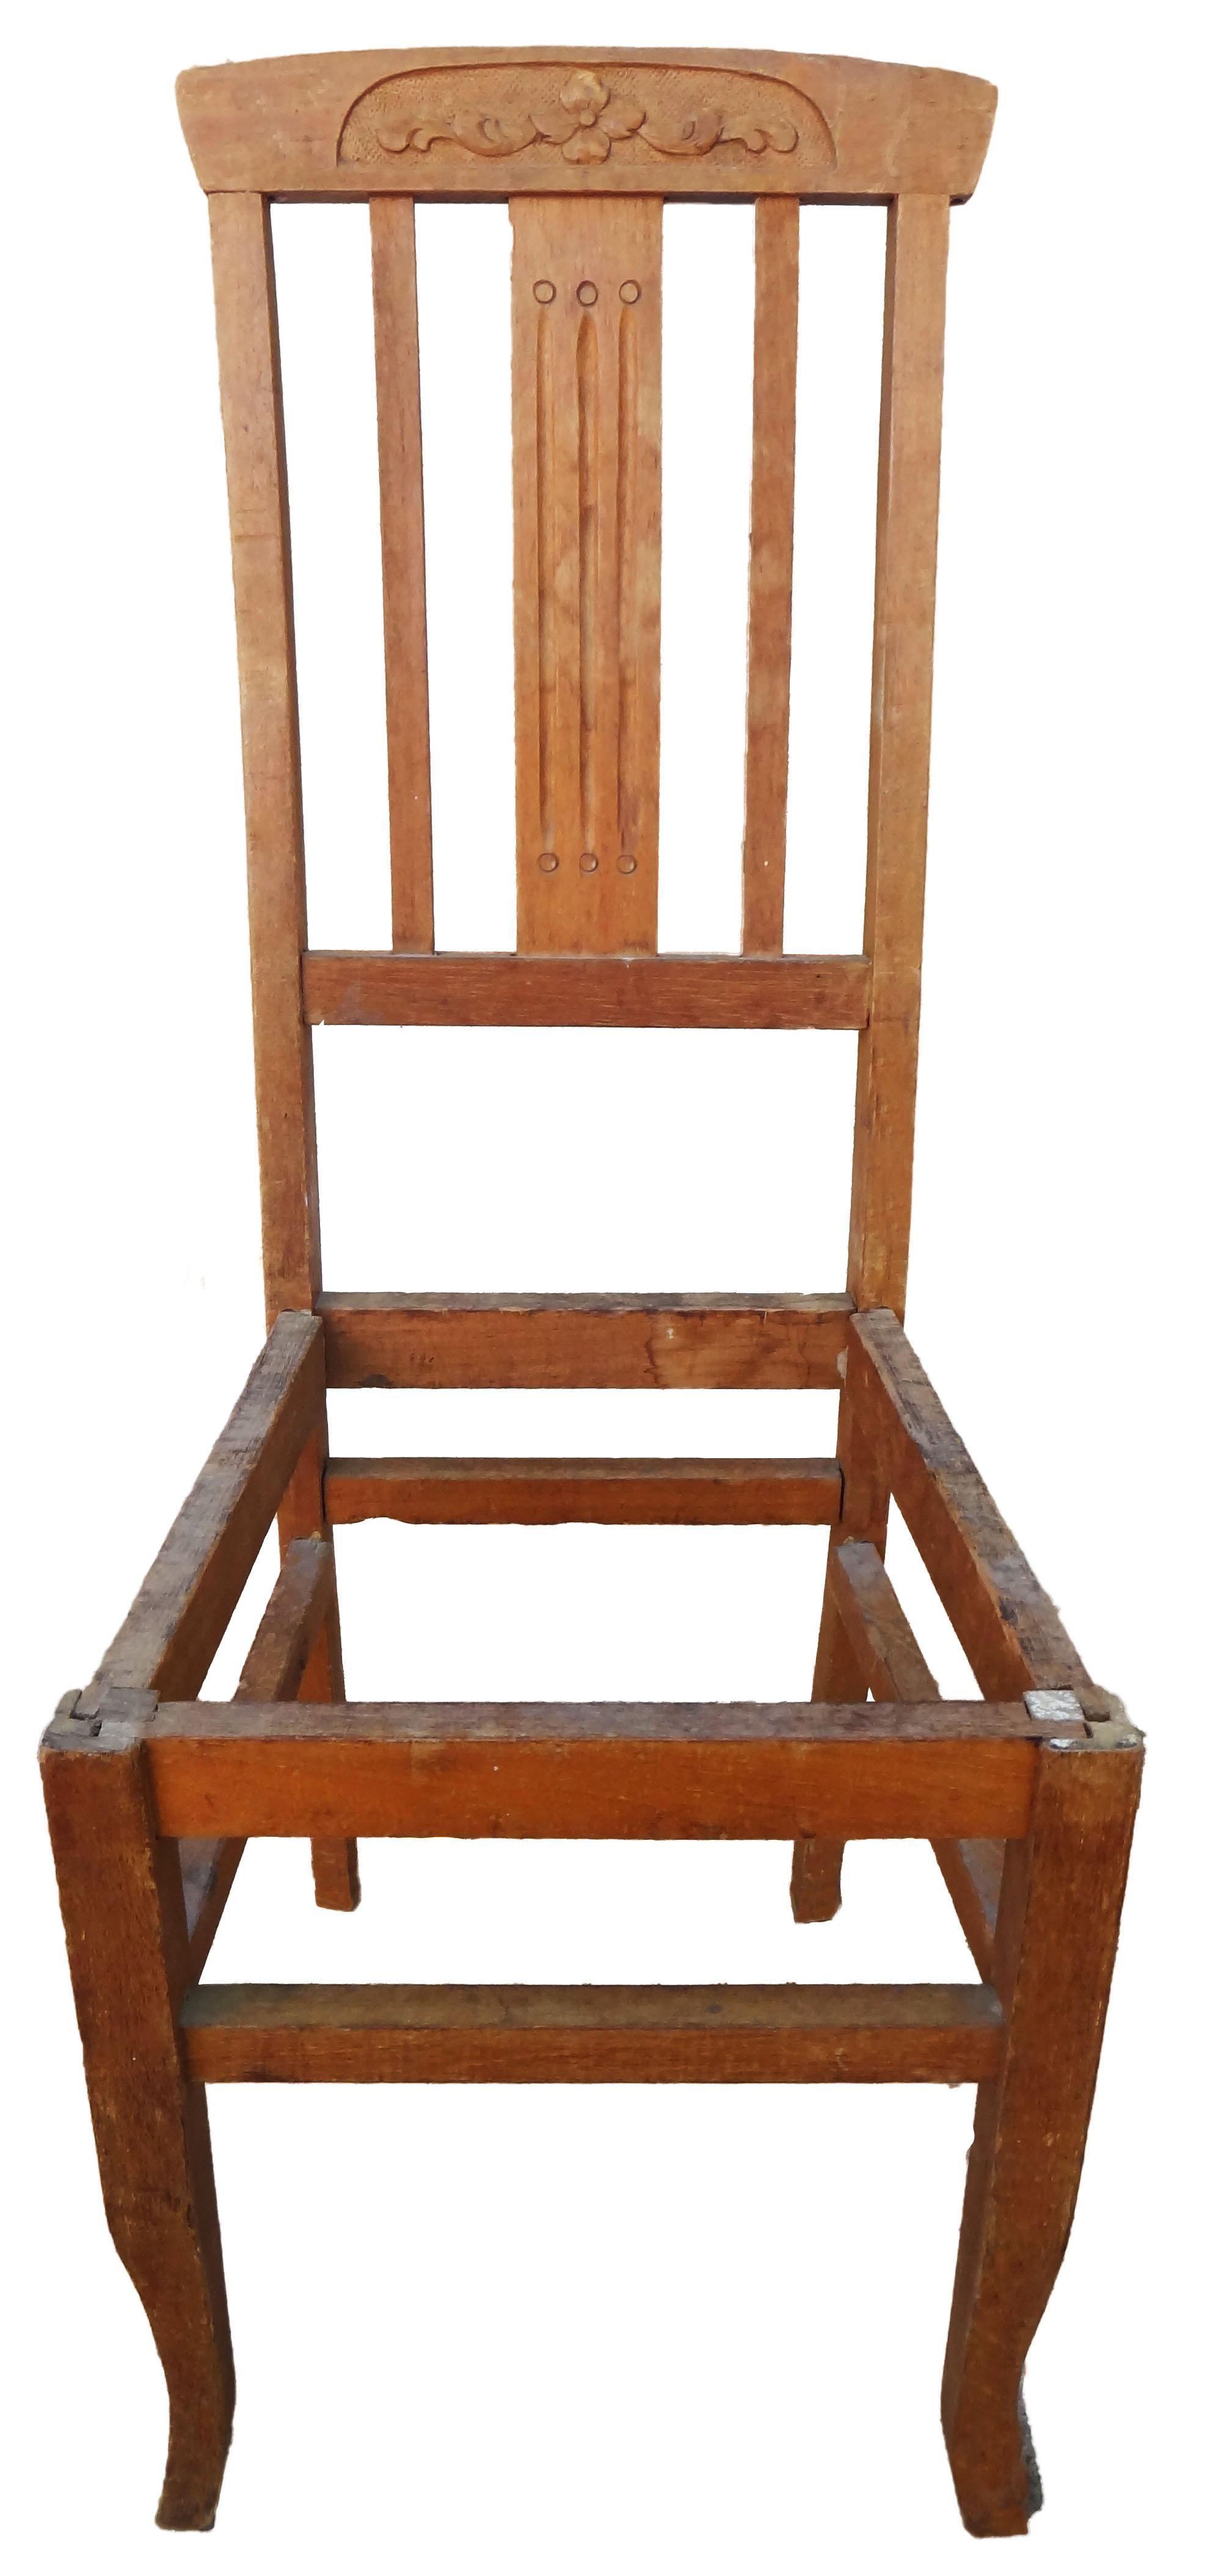 Sillas antiguas y modernas inicio for Modelos de sillas de madera modernas